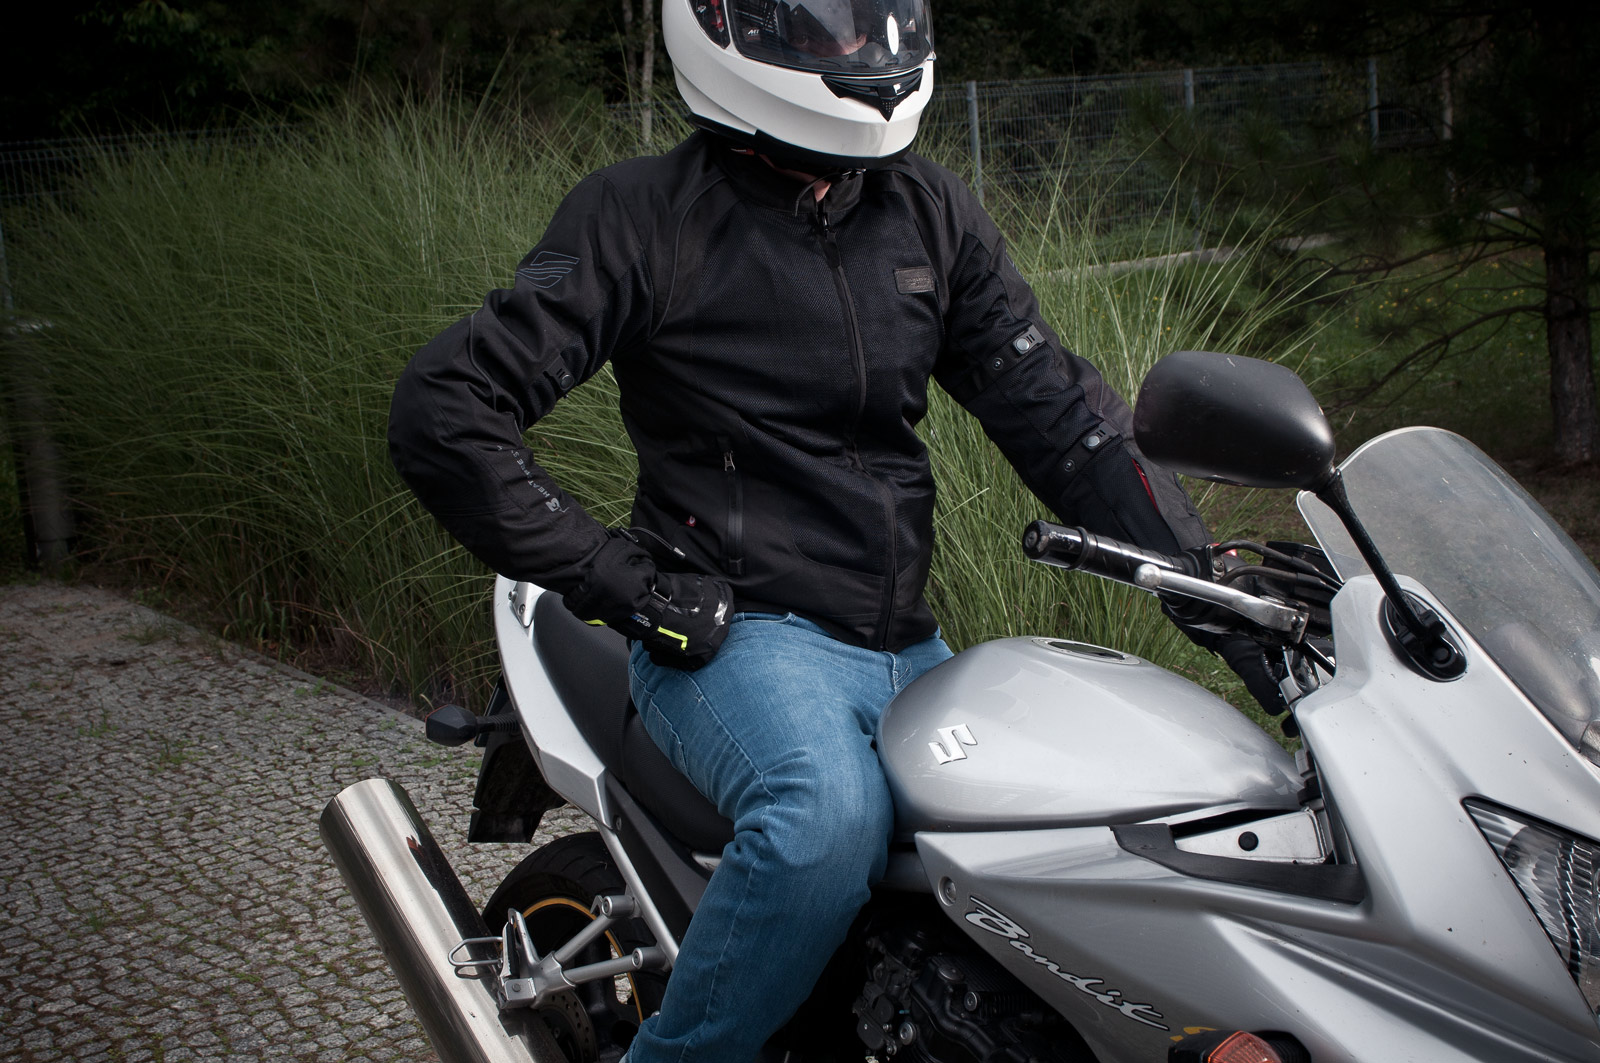 SHIMA诗玛 男士四季上装装备骑行摩托车装  X-MESH气流夹克